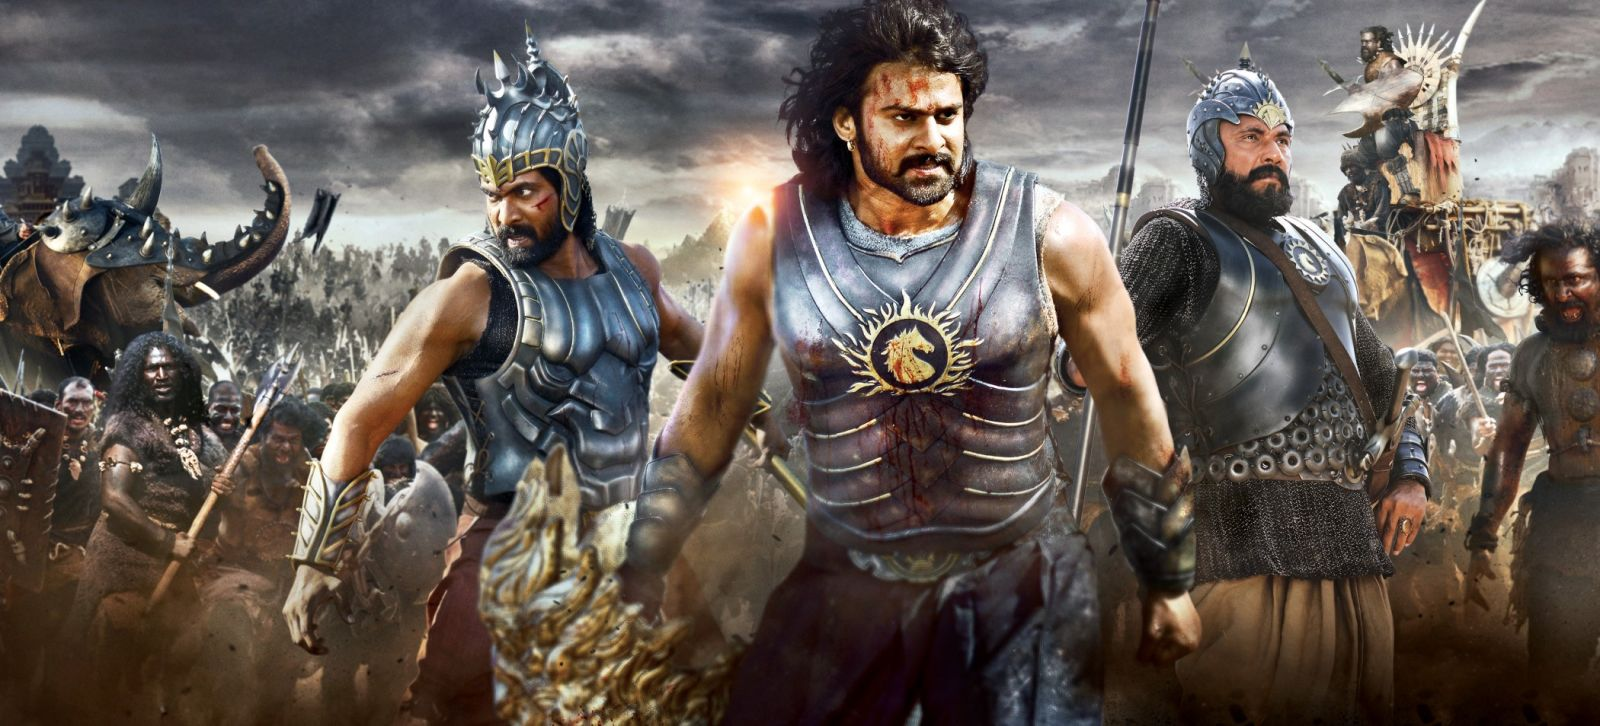 bahubali 2 hindi full movie download free